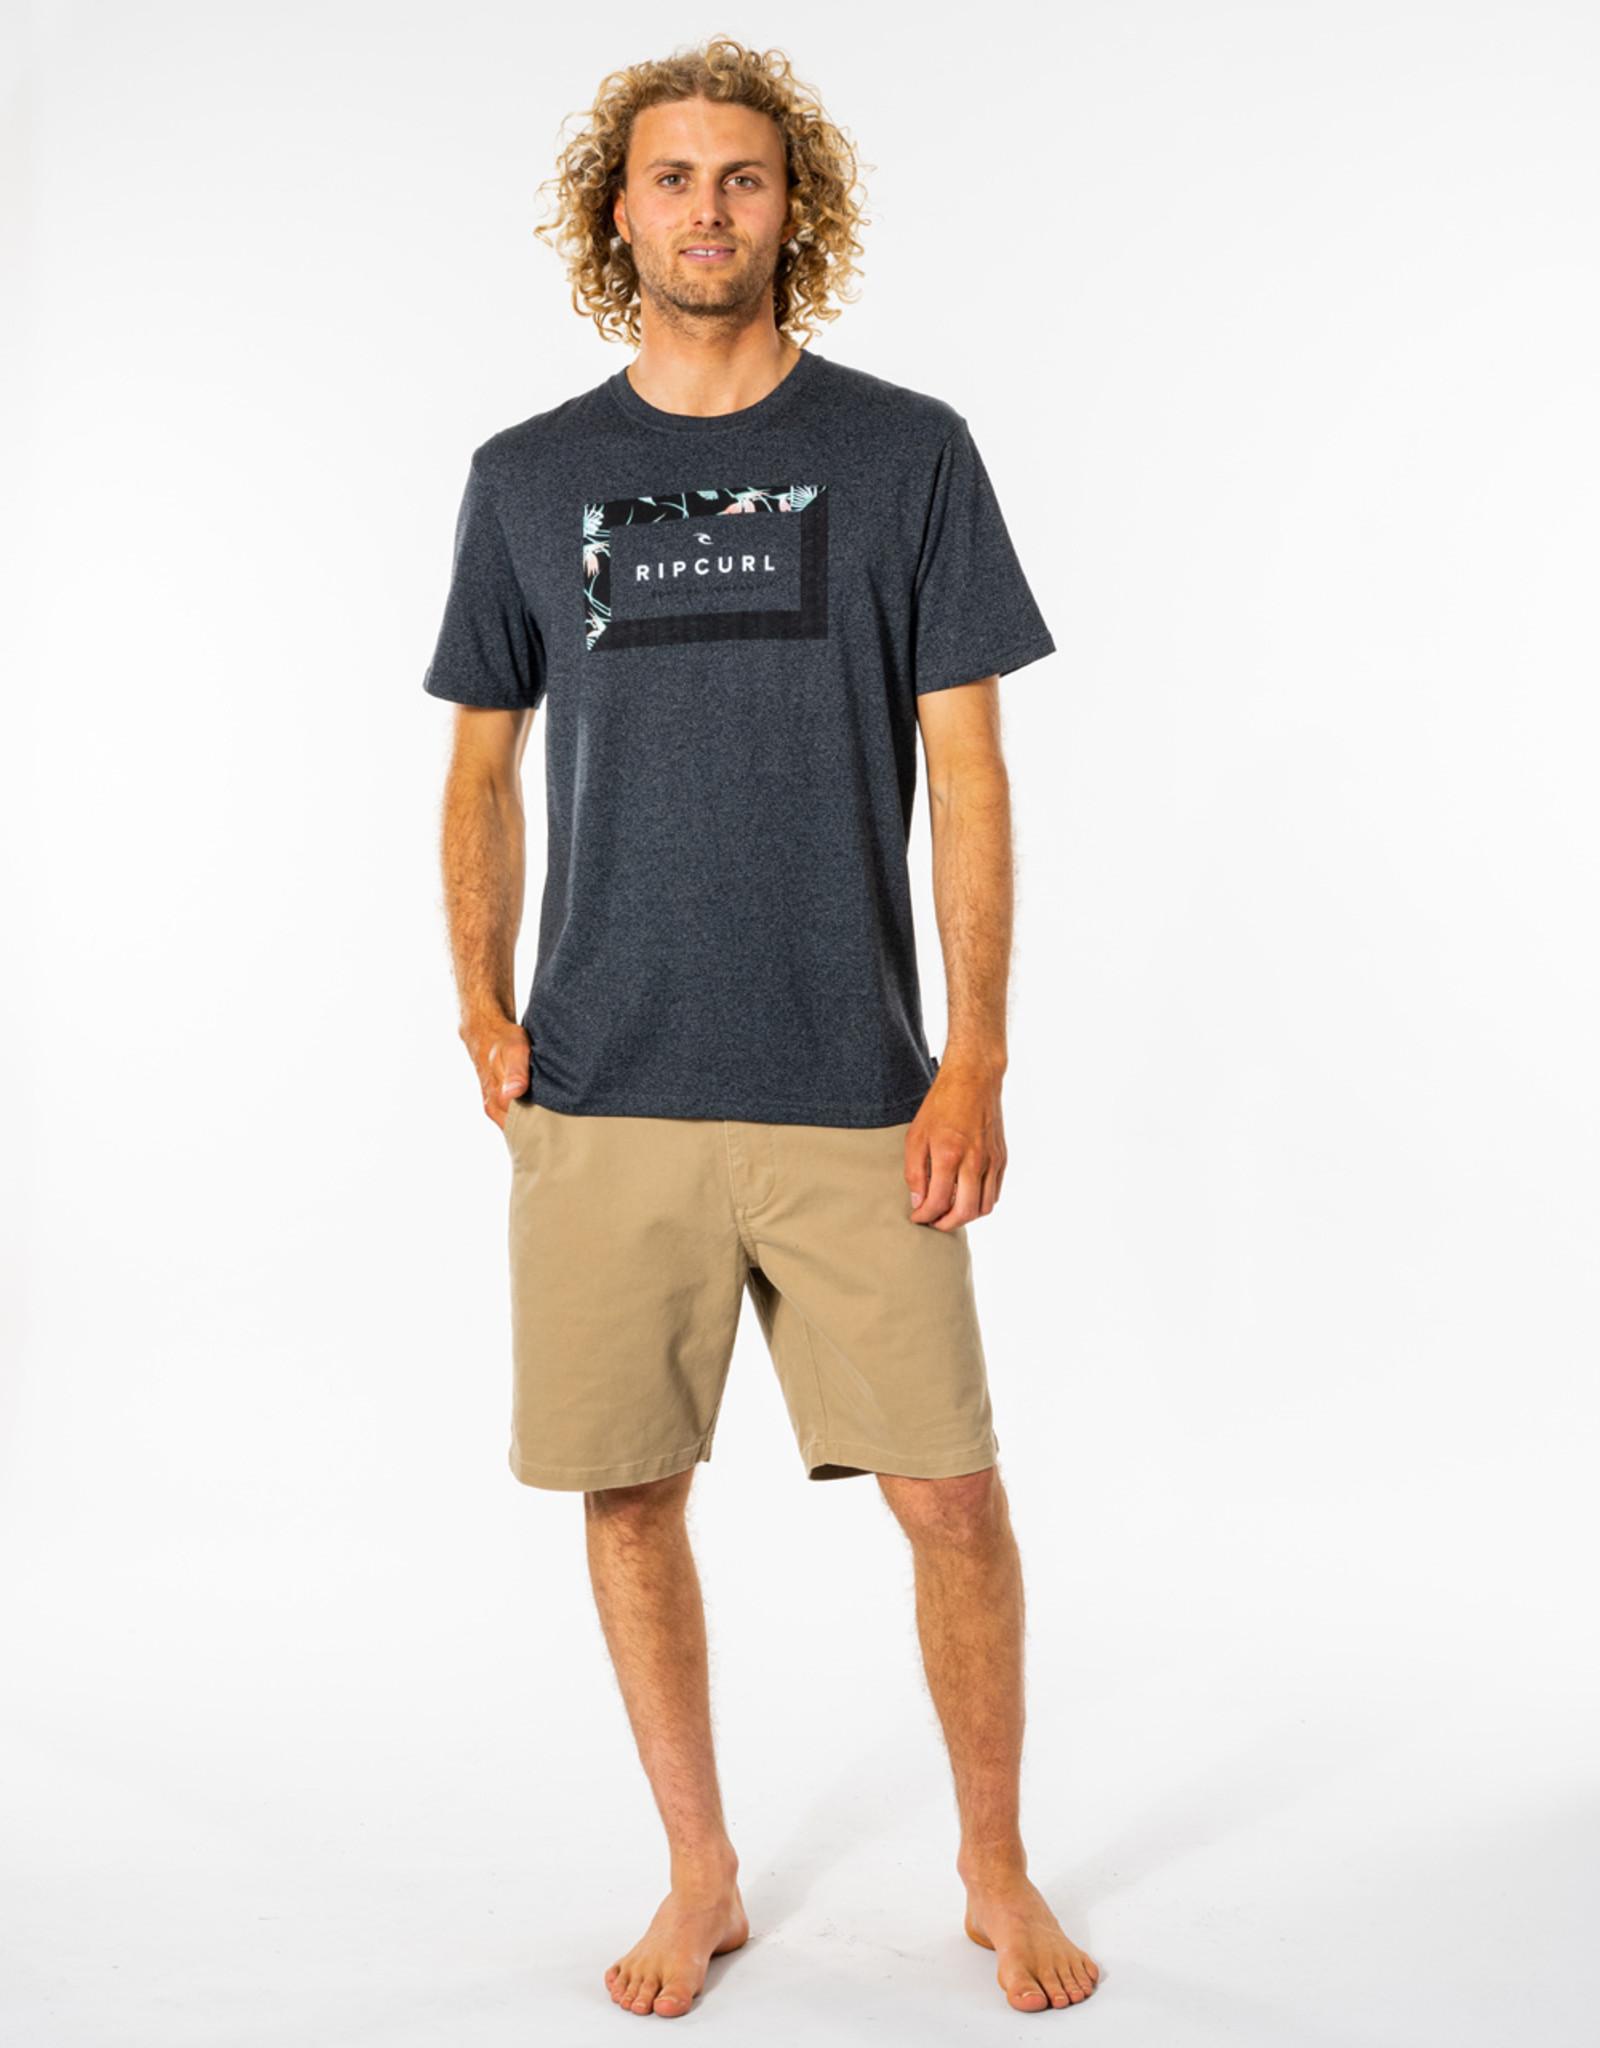 RIP CURL Tropic World T-Shirt